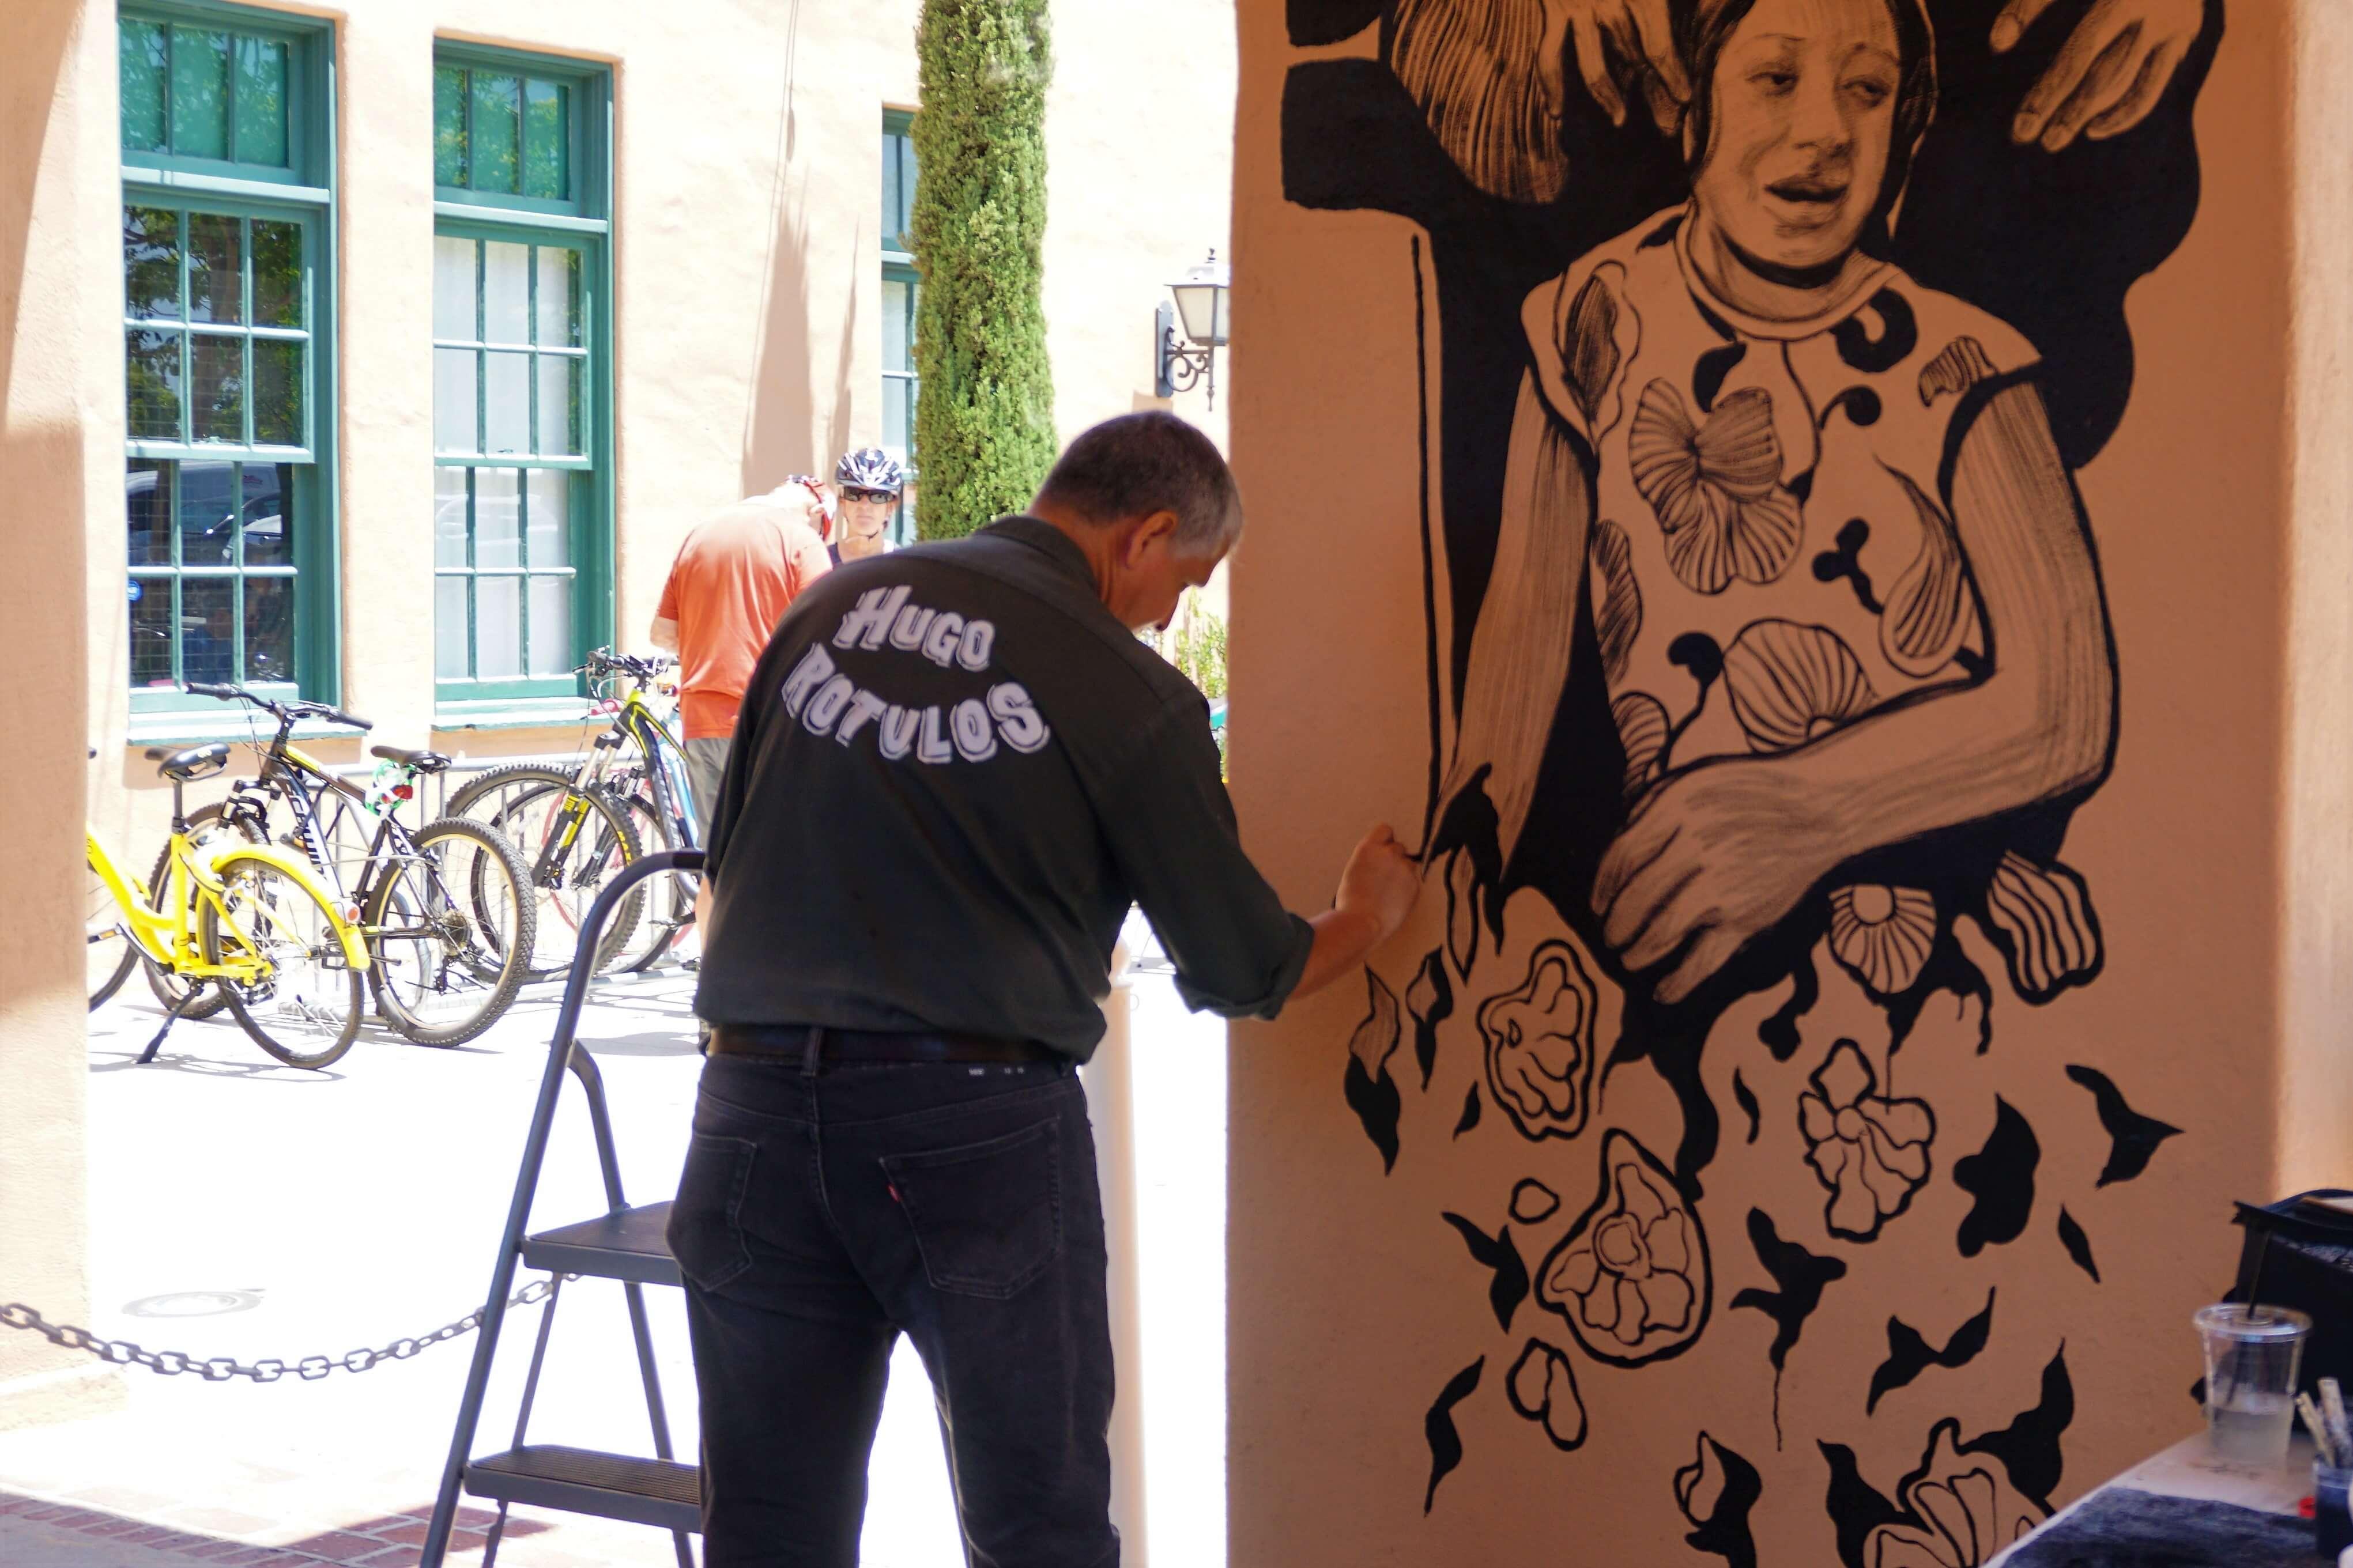 Artist Hugo Crosthwaite painting a mural outside Liberty Public Market